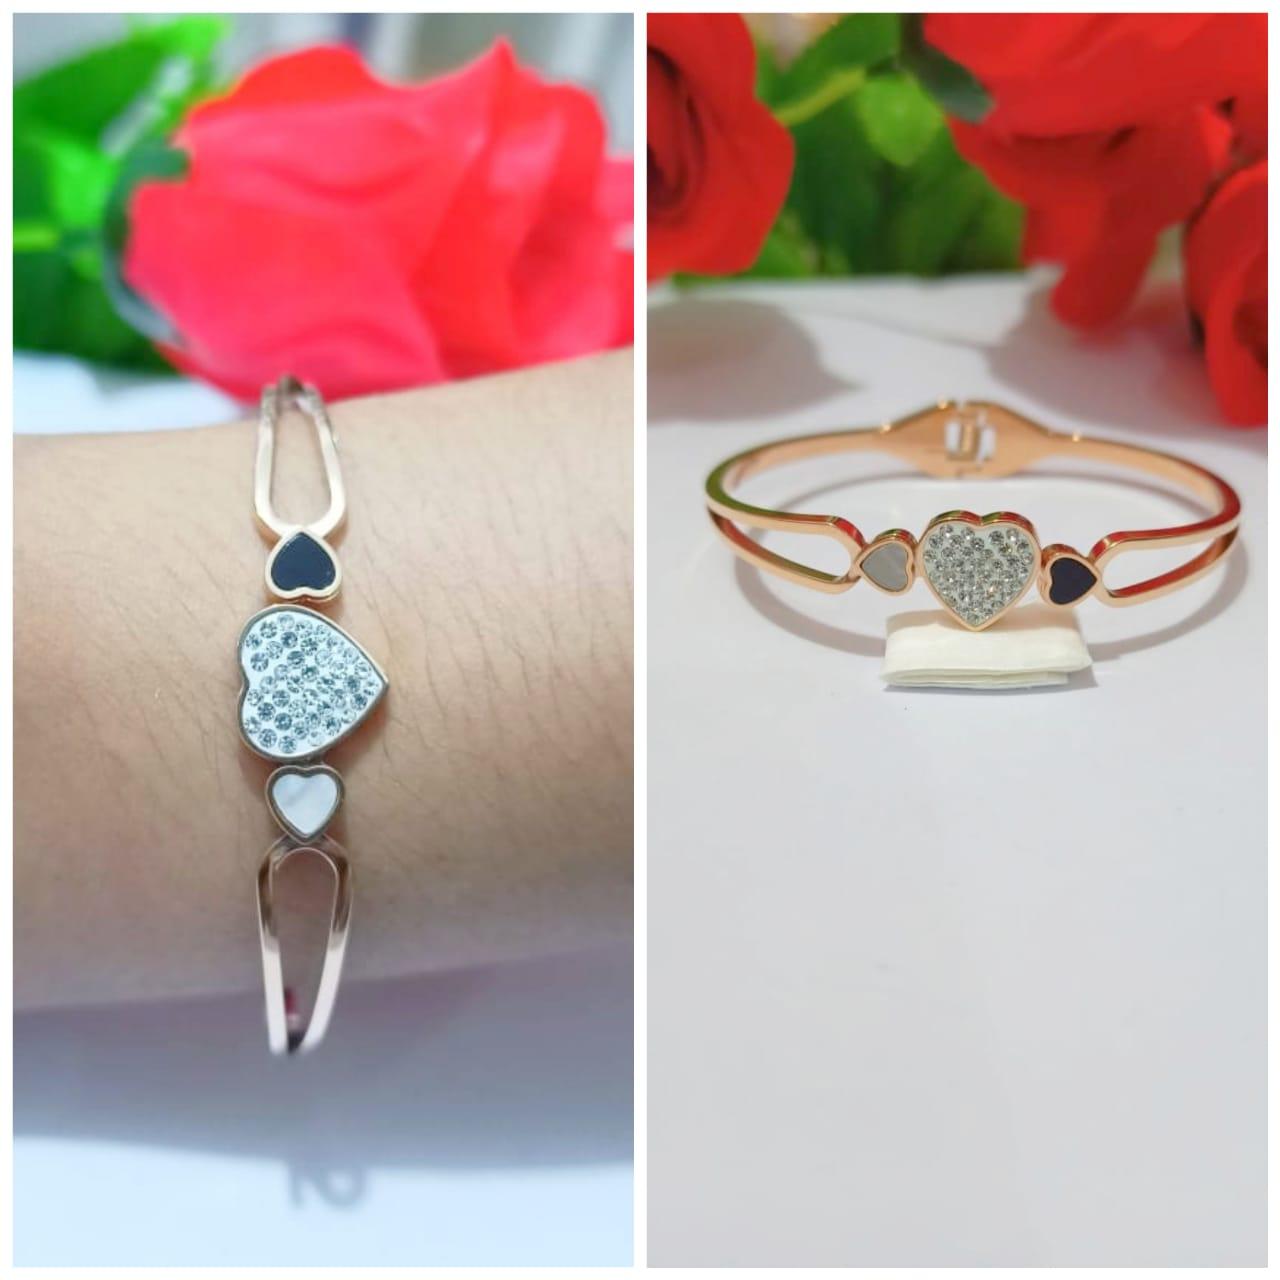 [four-u official store] gelang tangan pria / rantai stainless steel anti karat – silver